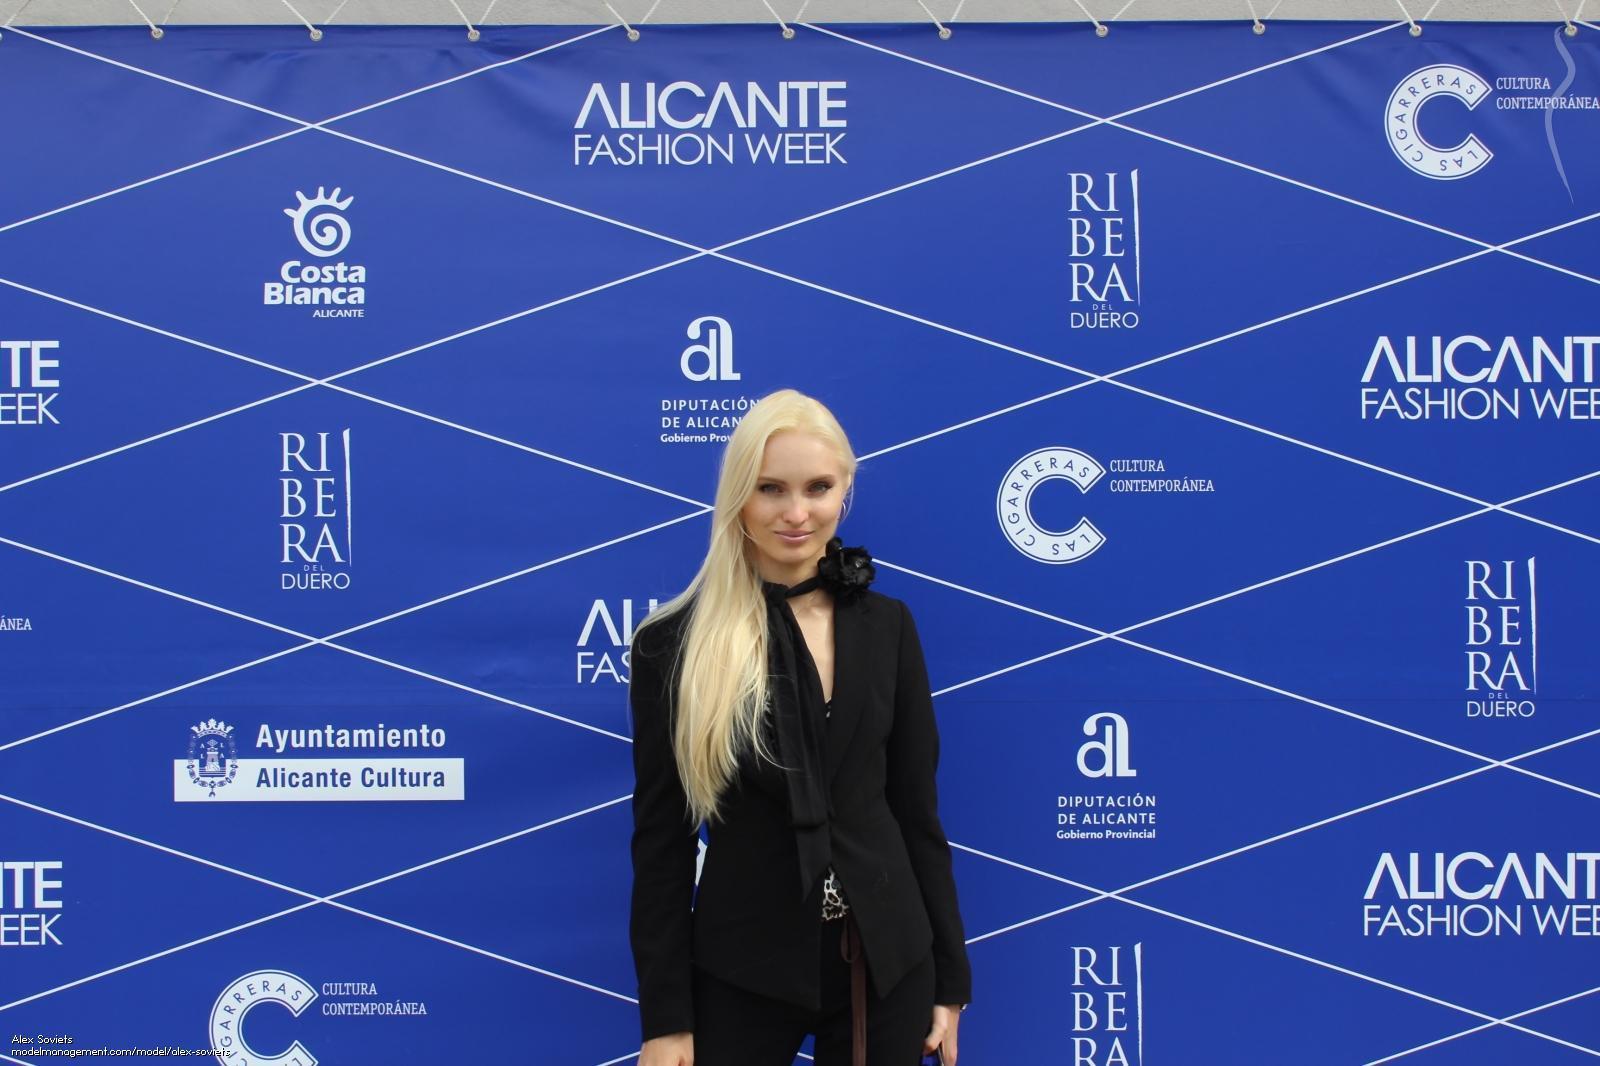 Primer Casting de Modelos Alicante Fashion Week 2017 en CC Habaneras entre el Jurado Oksana Peresadko (Alex Soviet's)